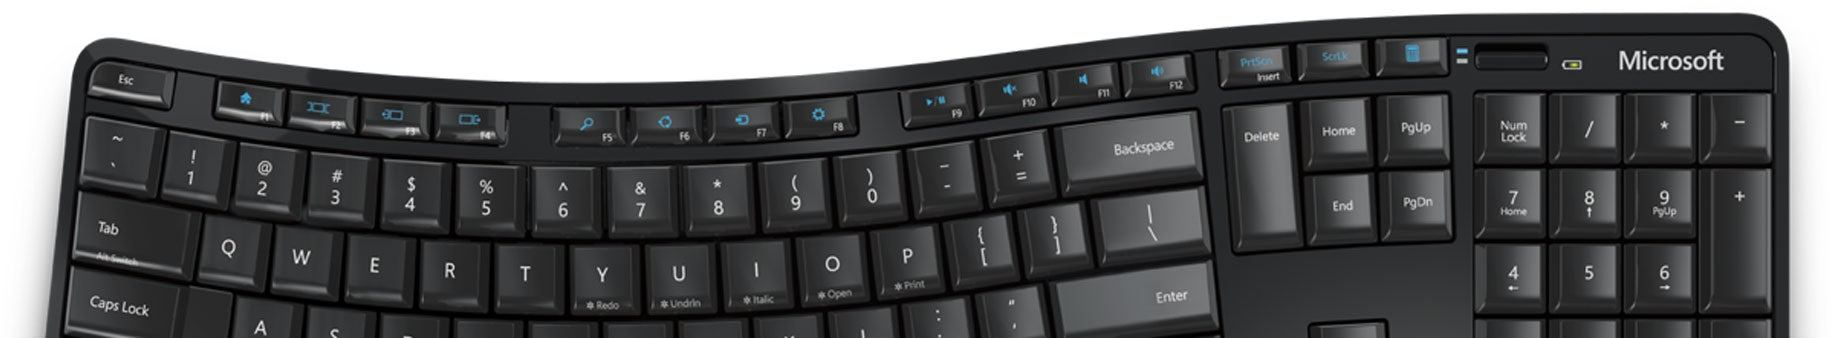 microsoft klávesnice